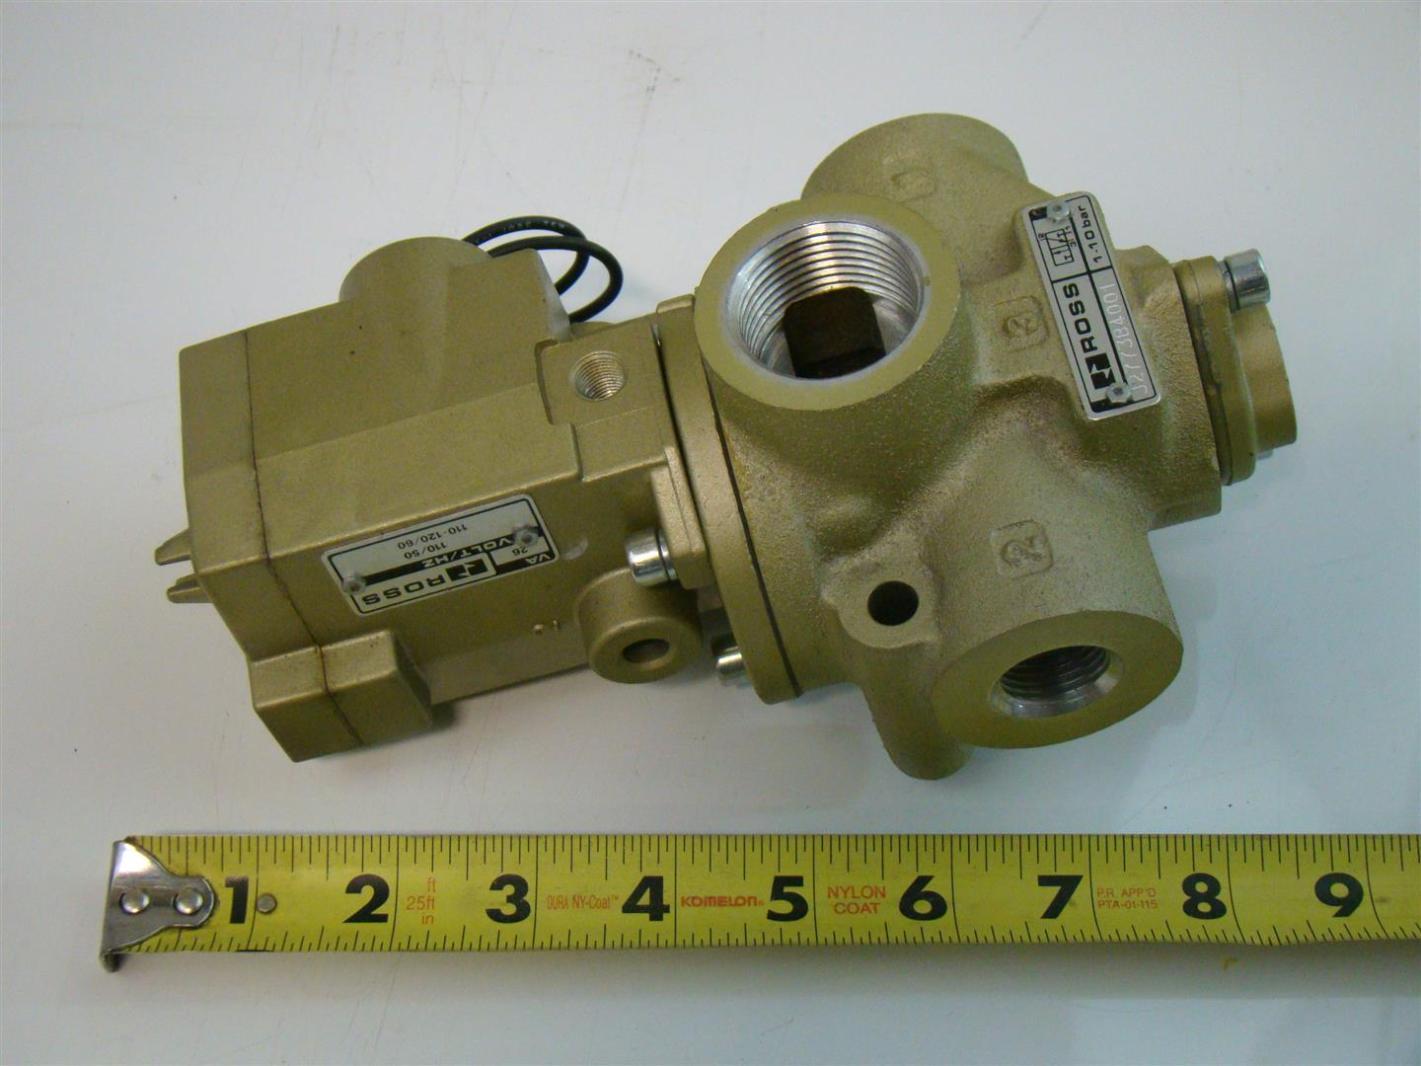 Ross 110 120v 1 10bar j2773b4001 joseph fazzio incorporated for Ross hydraulic motor seal kit